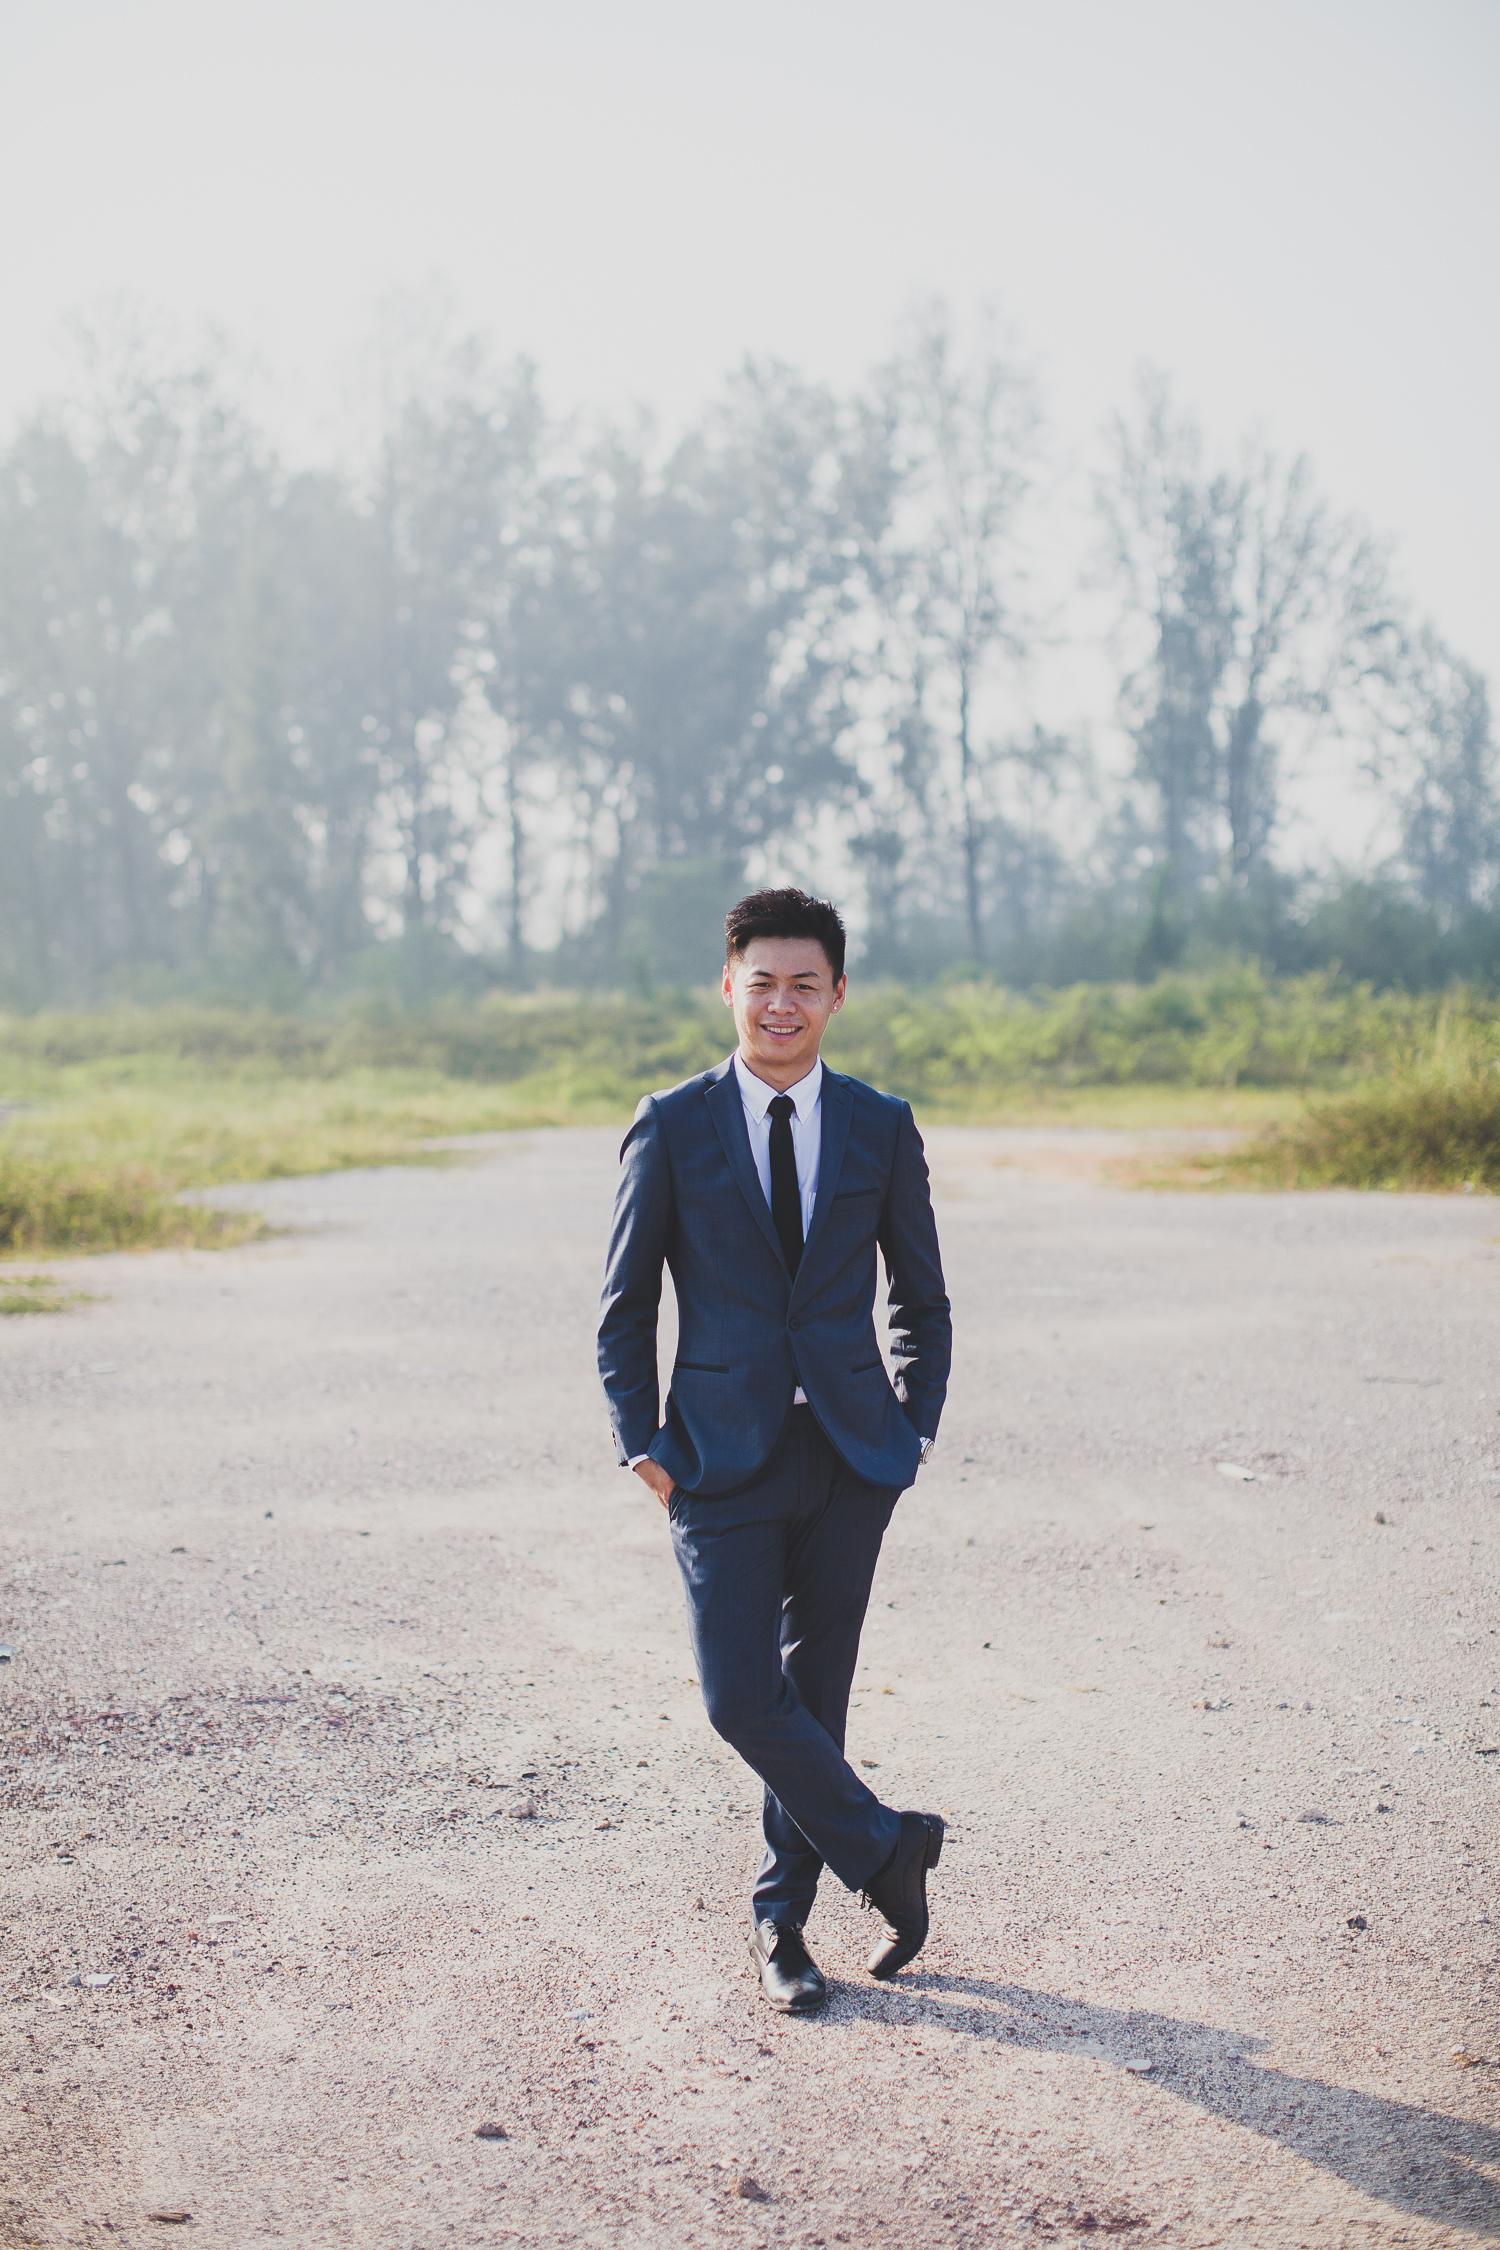 Singapore+Pre+Wedding+Photographer+Ziyang+Clara-0020.jpg